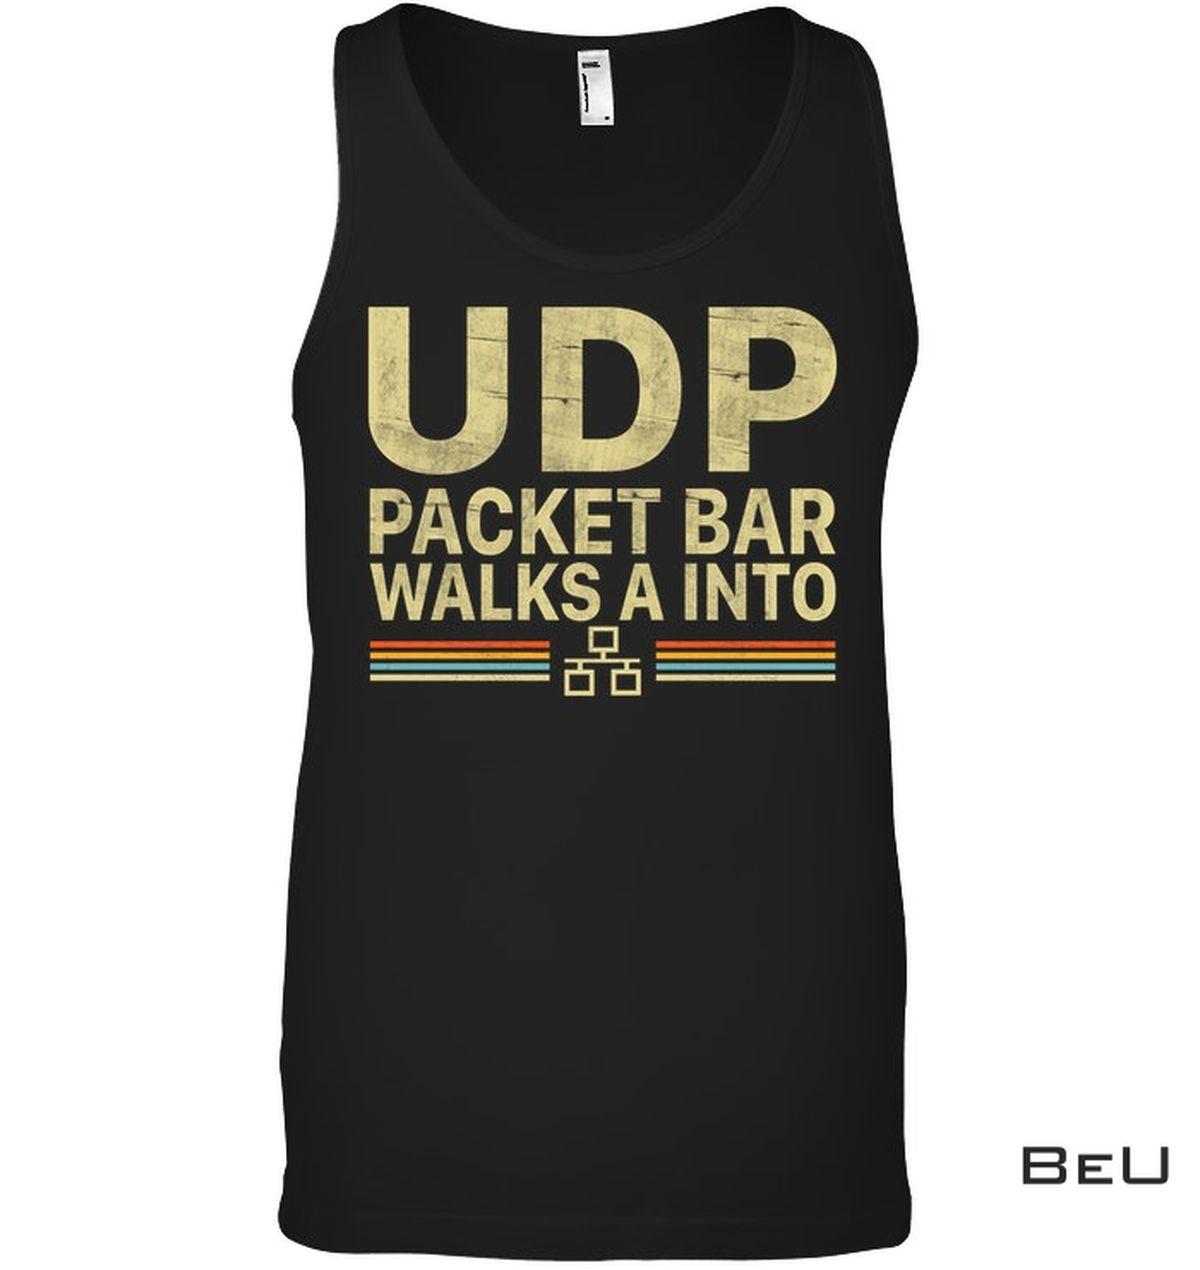 New UDP Packet Bar Walk A Into Shirt, hoodie, tank top